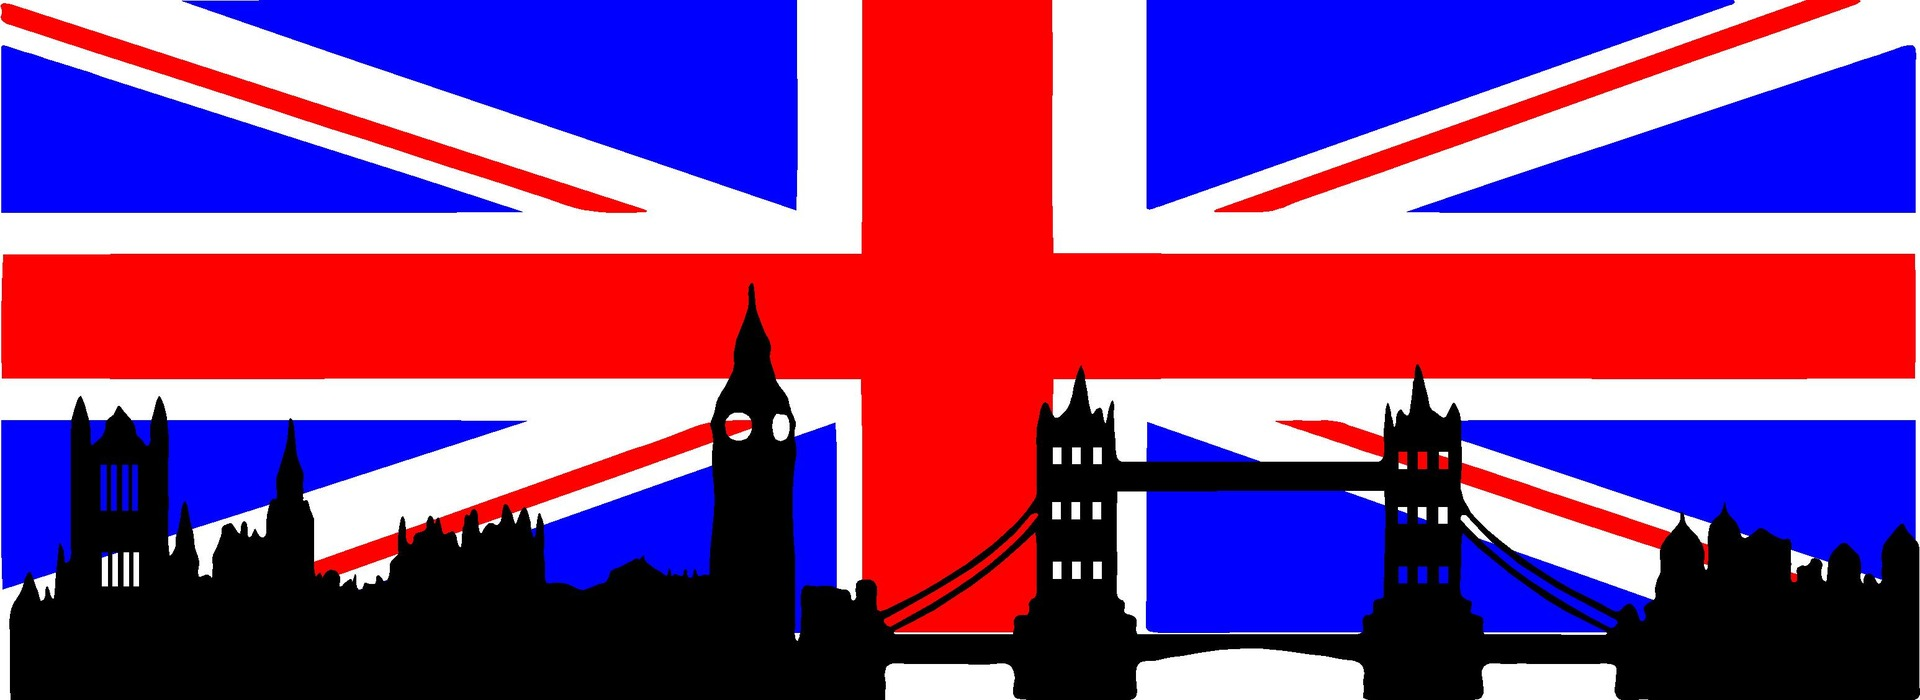 Angleterre 2017 Le Blog De Curie